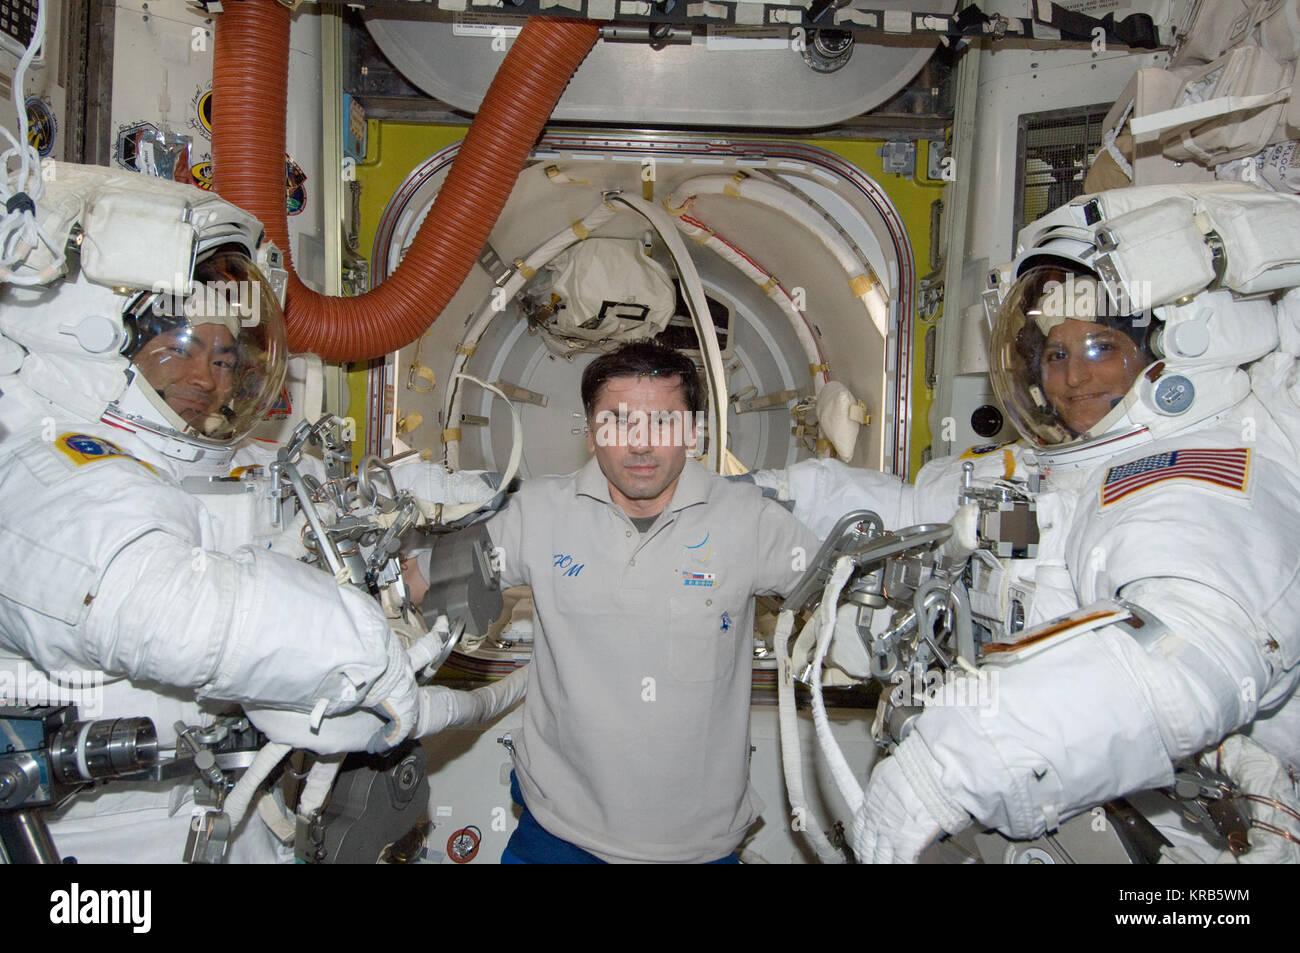 ISS-33 American EVA 00 Akihiko Hoshide, Yuri Malenchenko and Sunita Williams - Stock Image